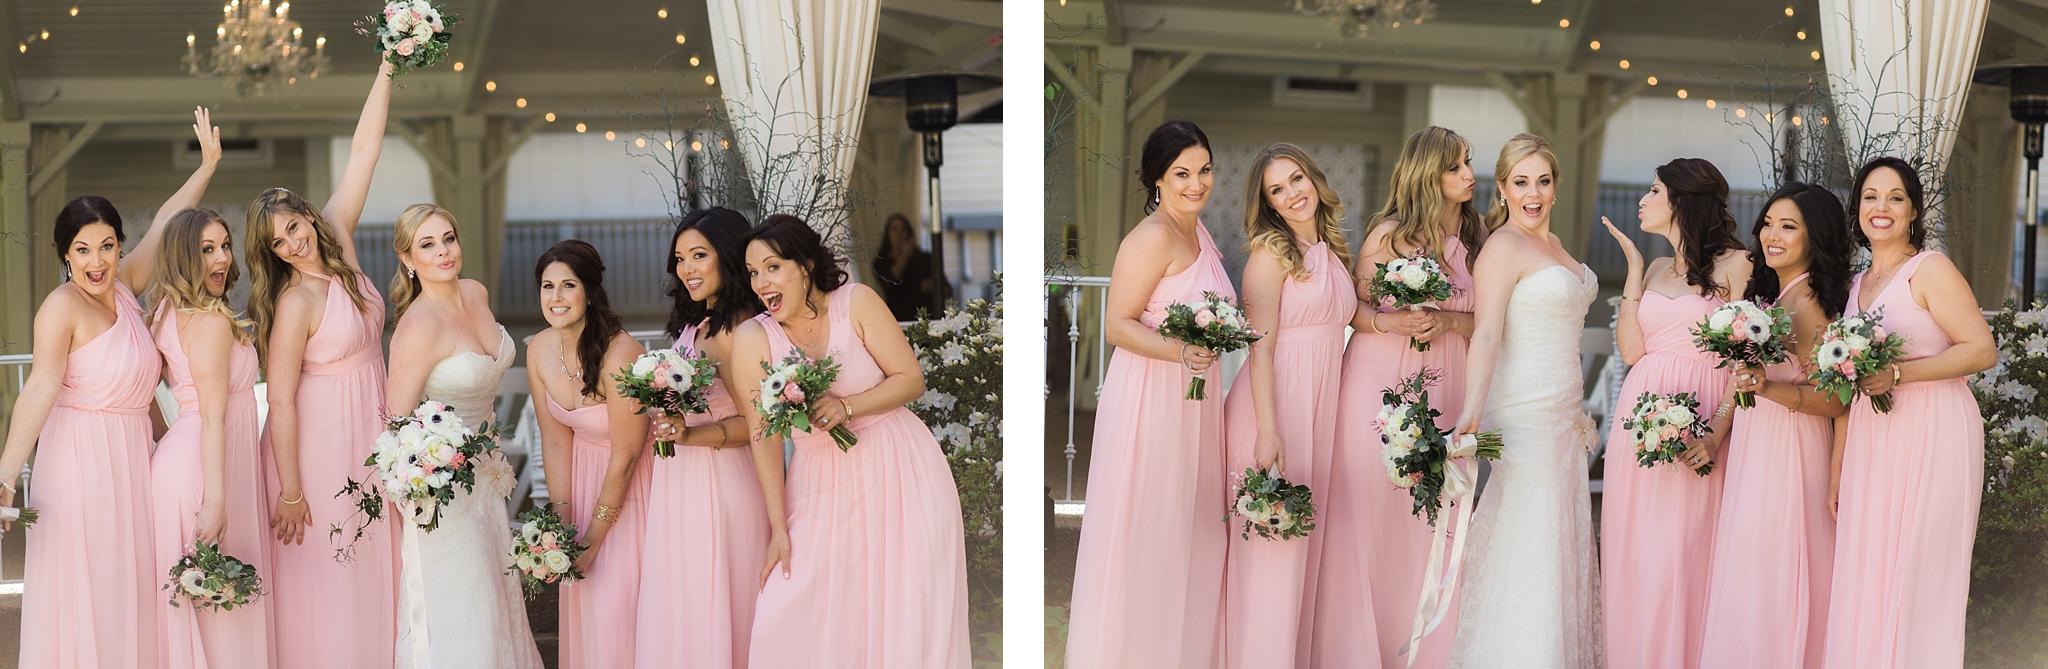 cjs-square-franklin-bridesmaids.jpg